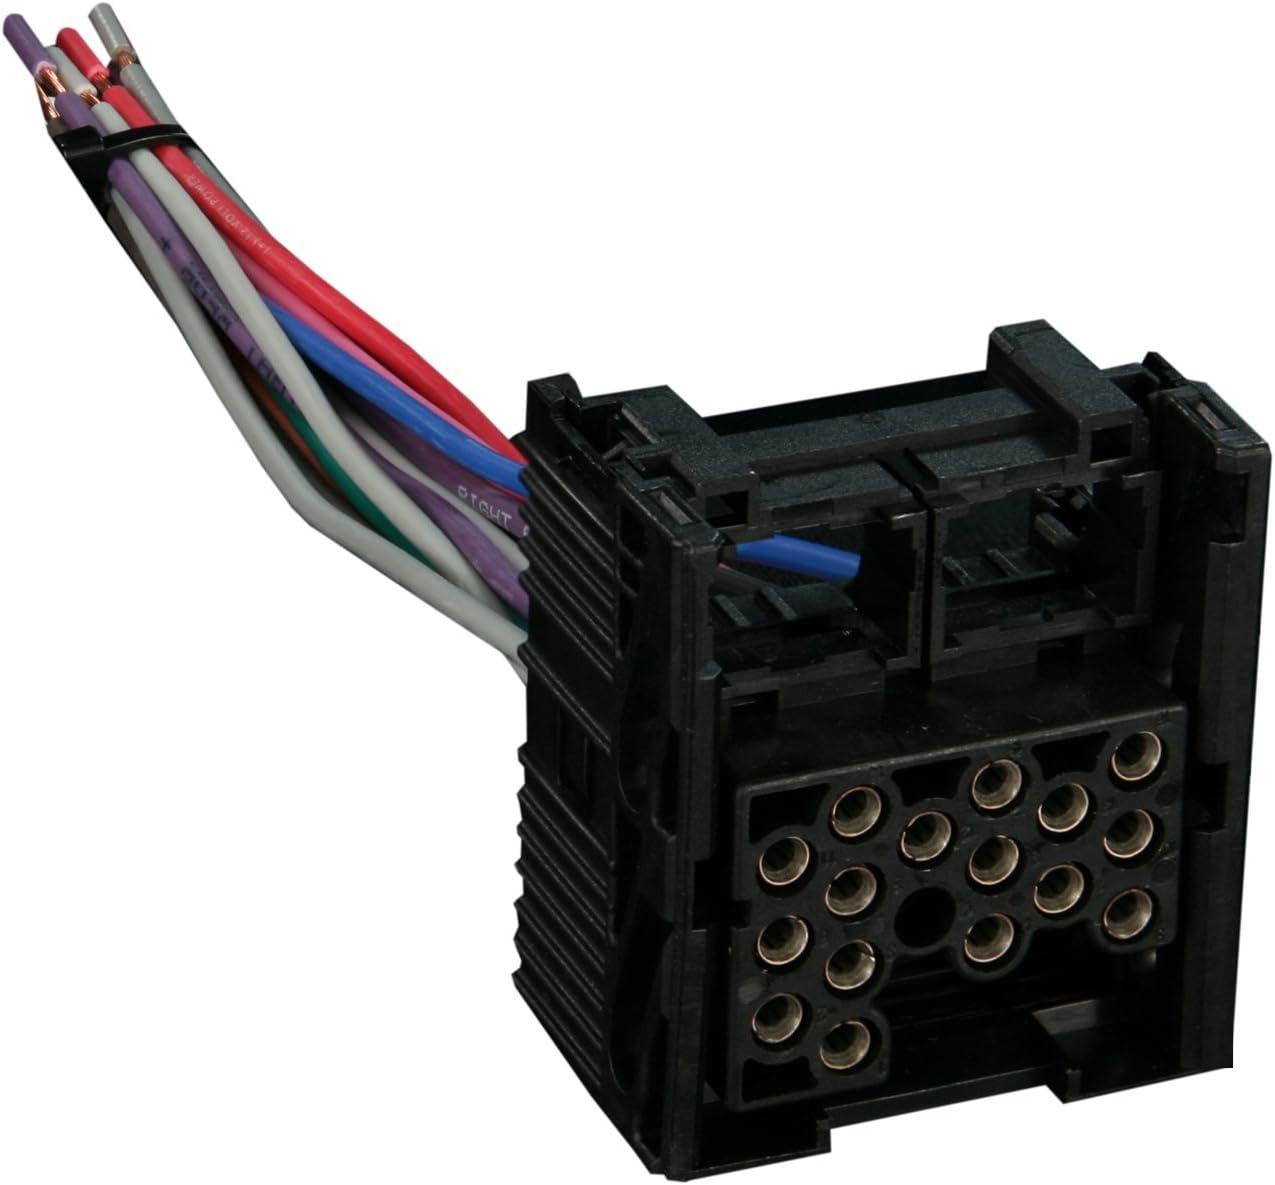 bmw 2002 wiring harness amazon com metra 71 8590 reverse wiring harness for select 1990  metra 71 8590 reverse wiring harness